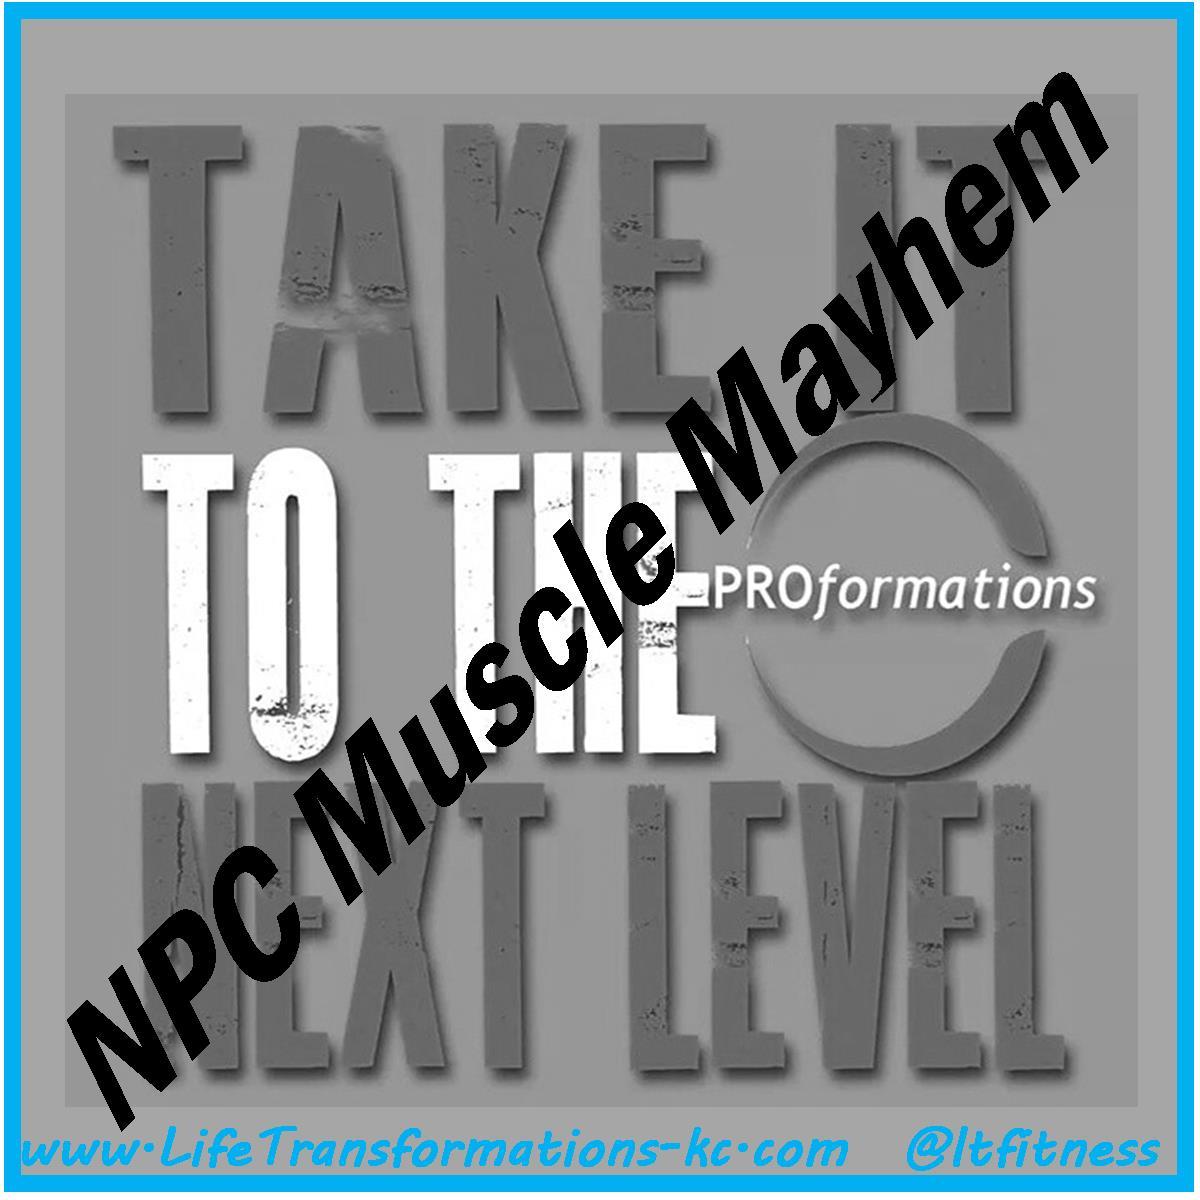 Team PROformations npc muscle mayhem